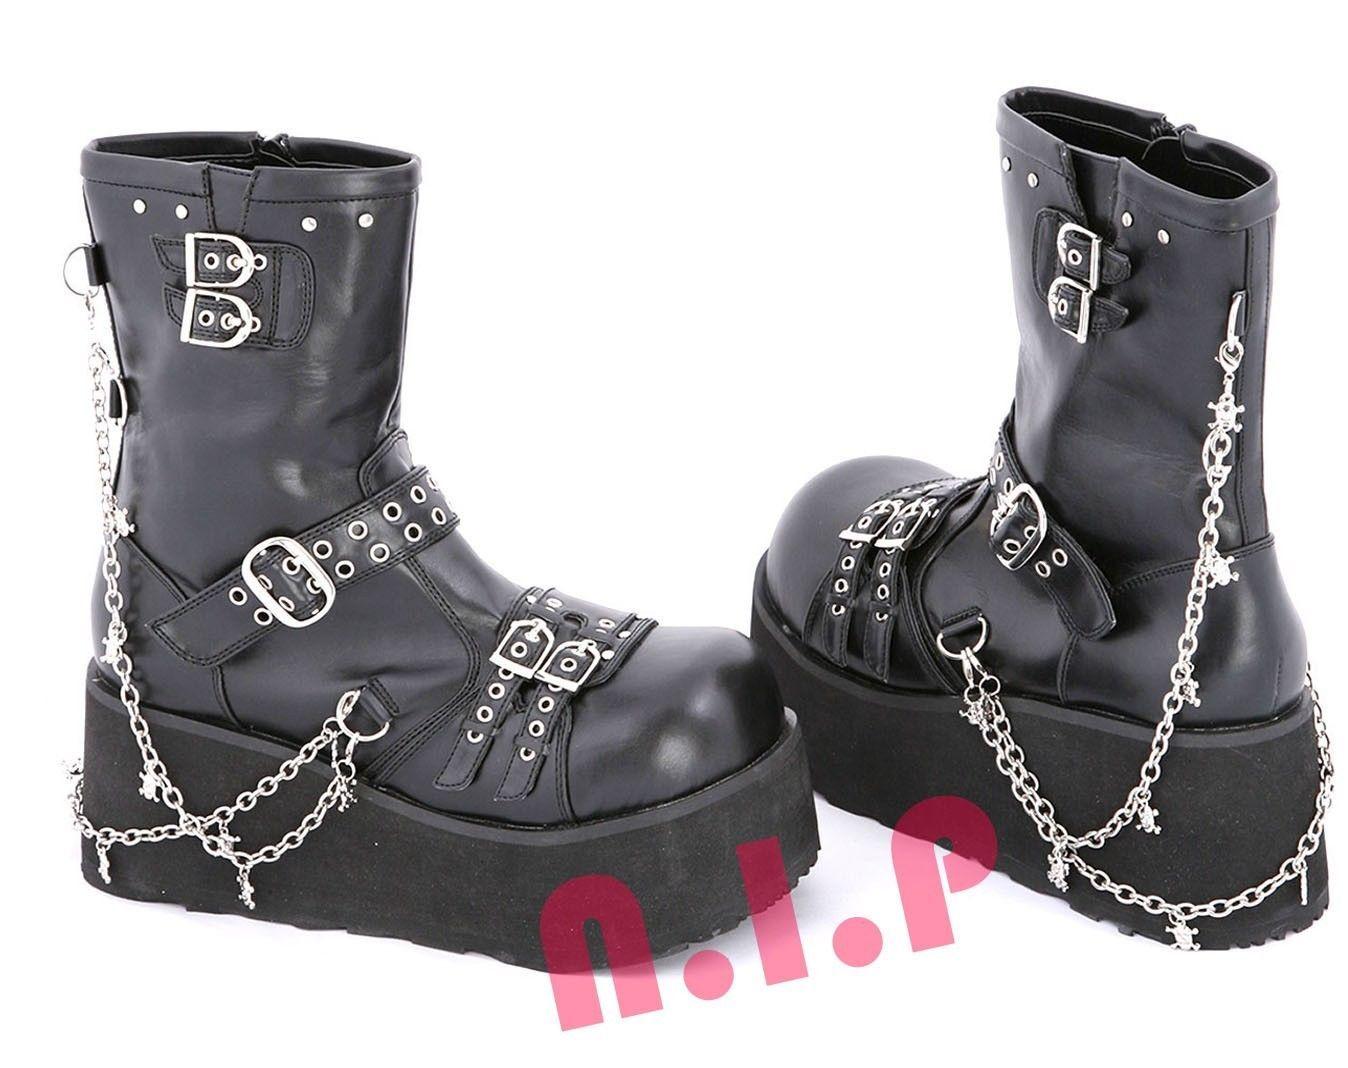 11ea4091ee72 Demonia SKULL Platform Heavy Metal Punk Goth Club Cyber CHAIN CALF Boots  Shoes